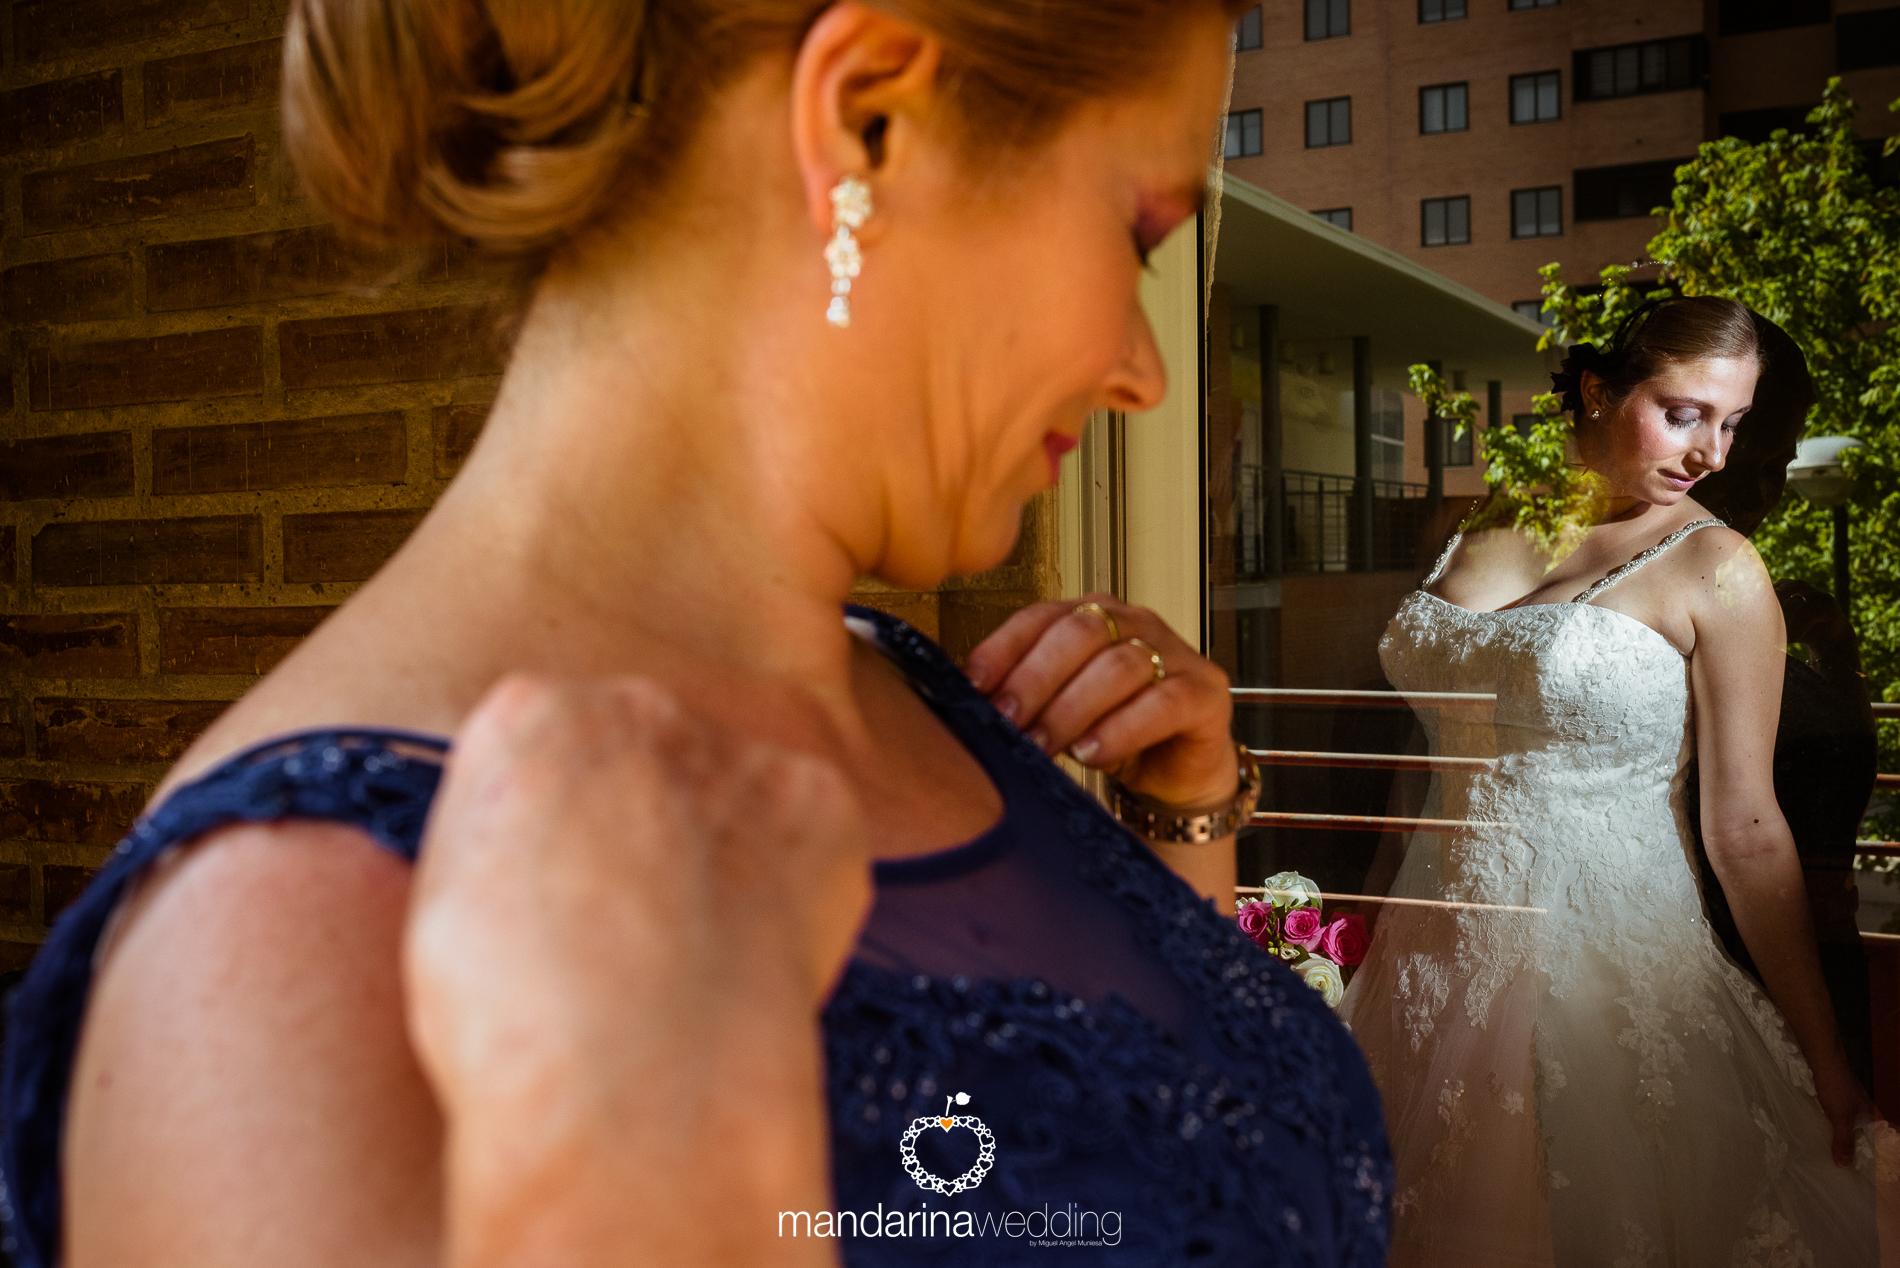 mandarina wedding, mejores fotografos boda, fotografo zaragoza, fotografo huesca, fotografo soria, fotografo lerida_44